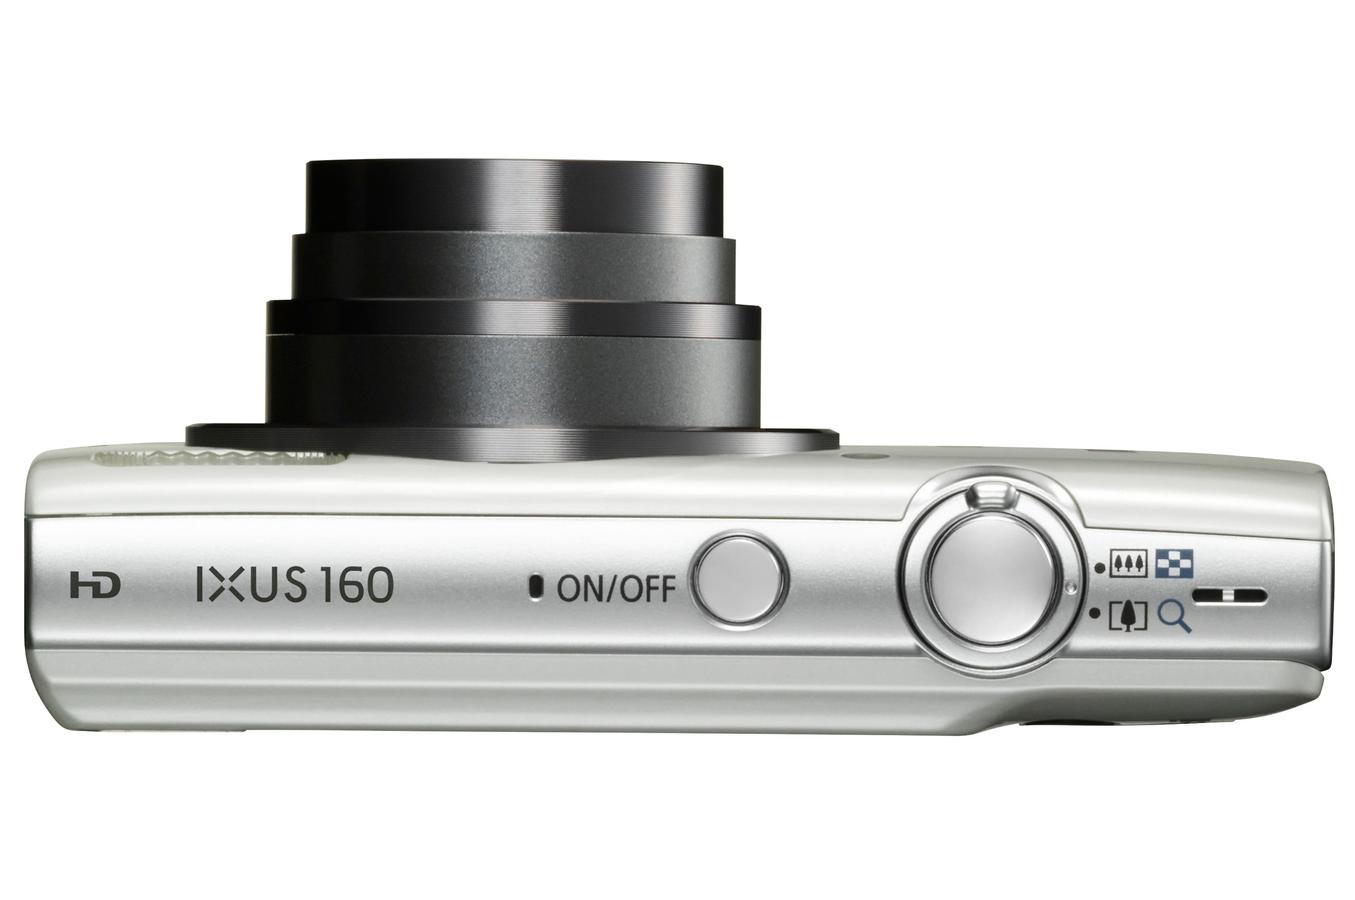 appareil photo compact canon ixus 160 blanc ixus 160 4080866 darty. Black Bedroom Furniture Sets. Home Design Ideas